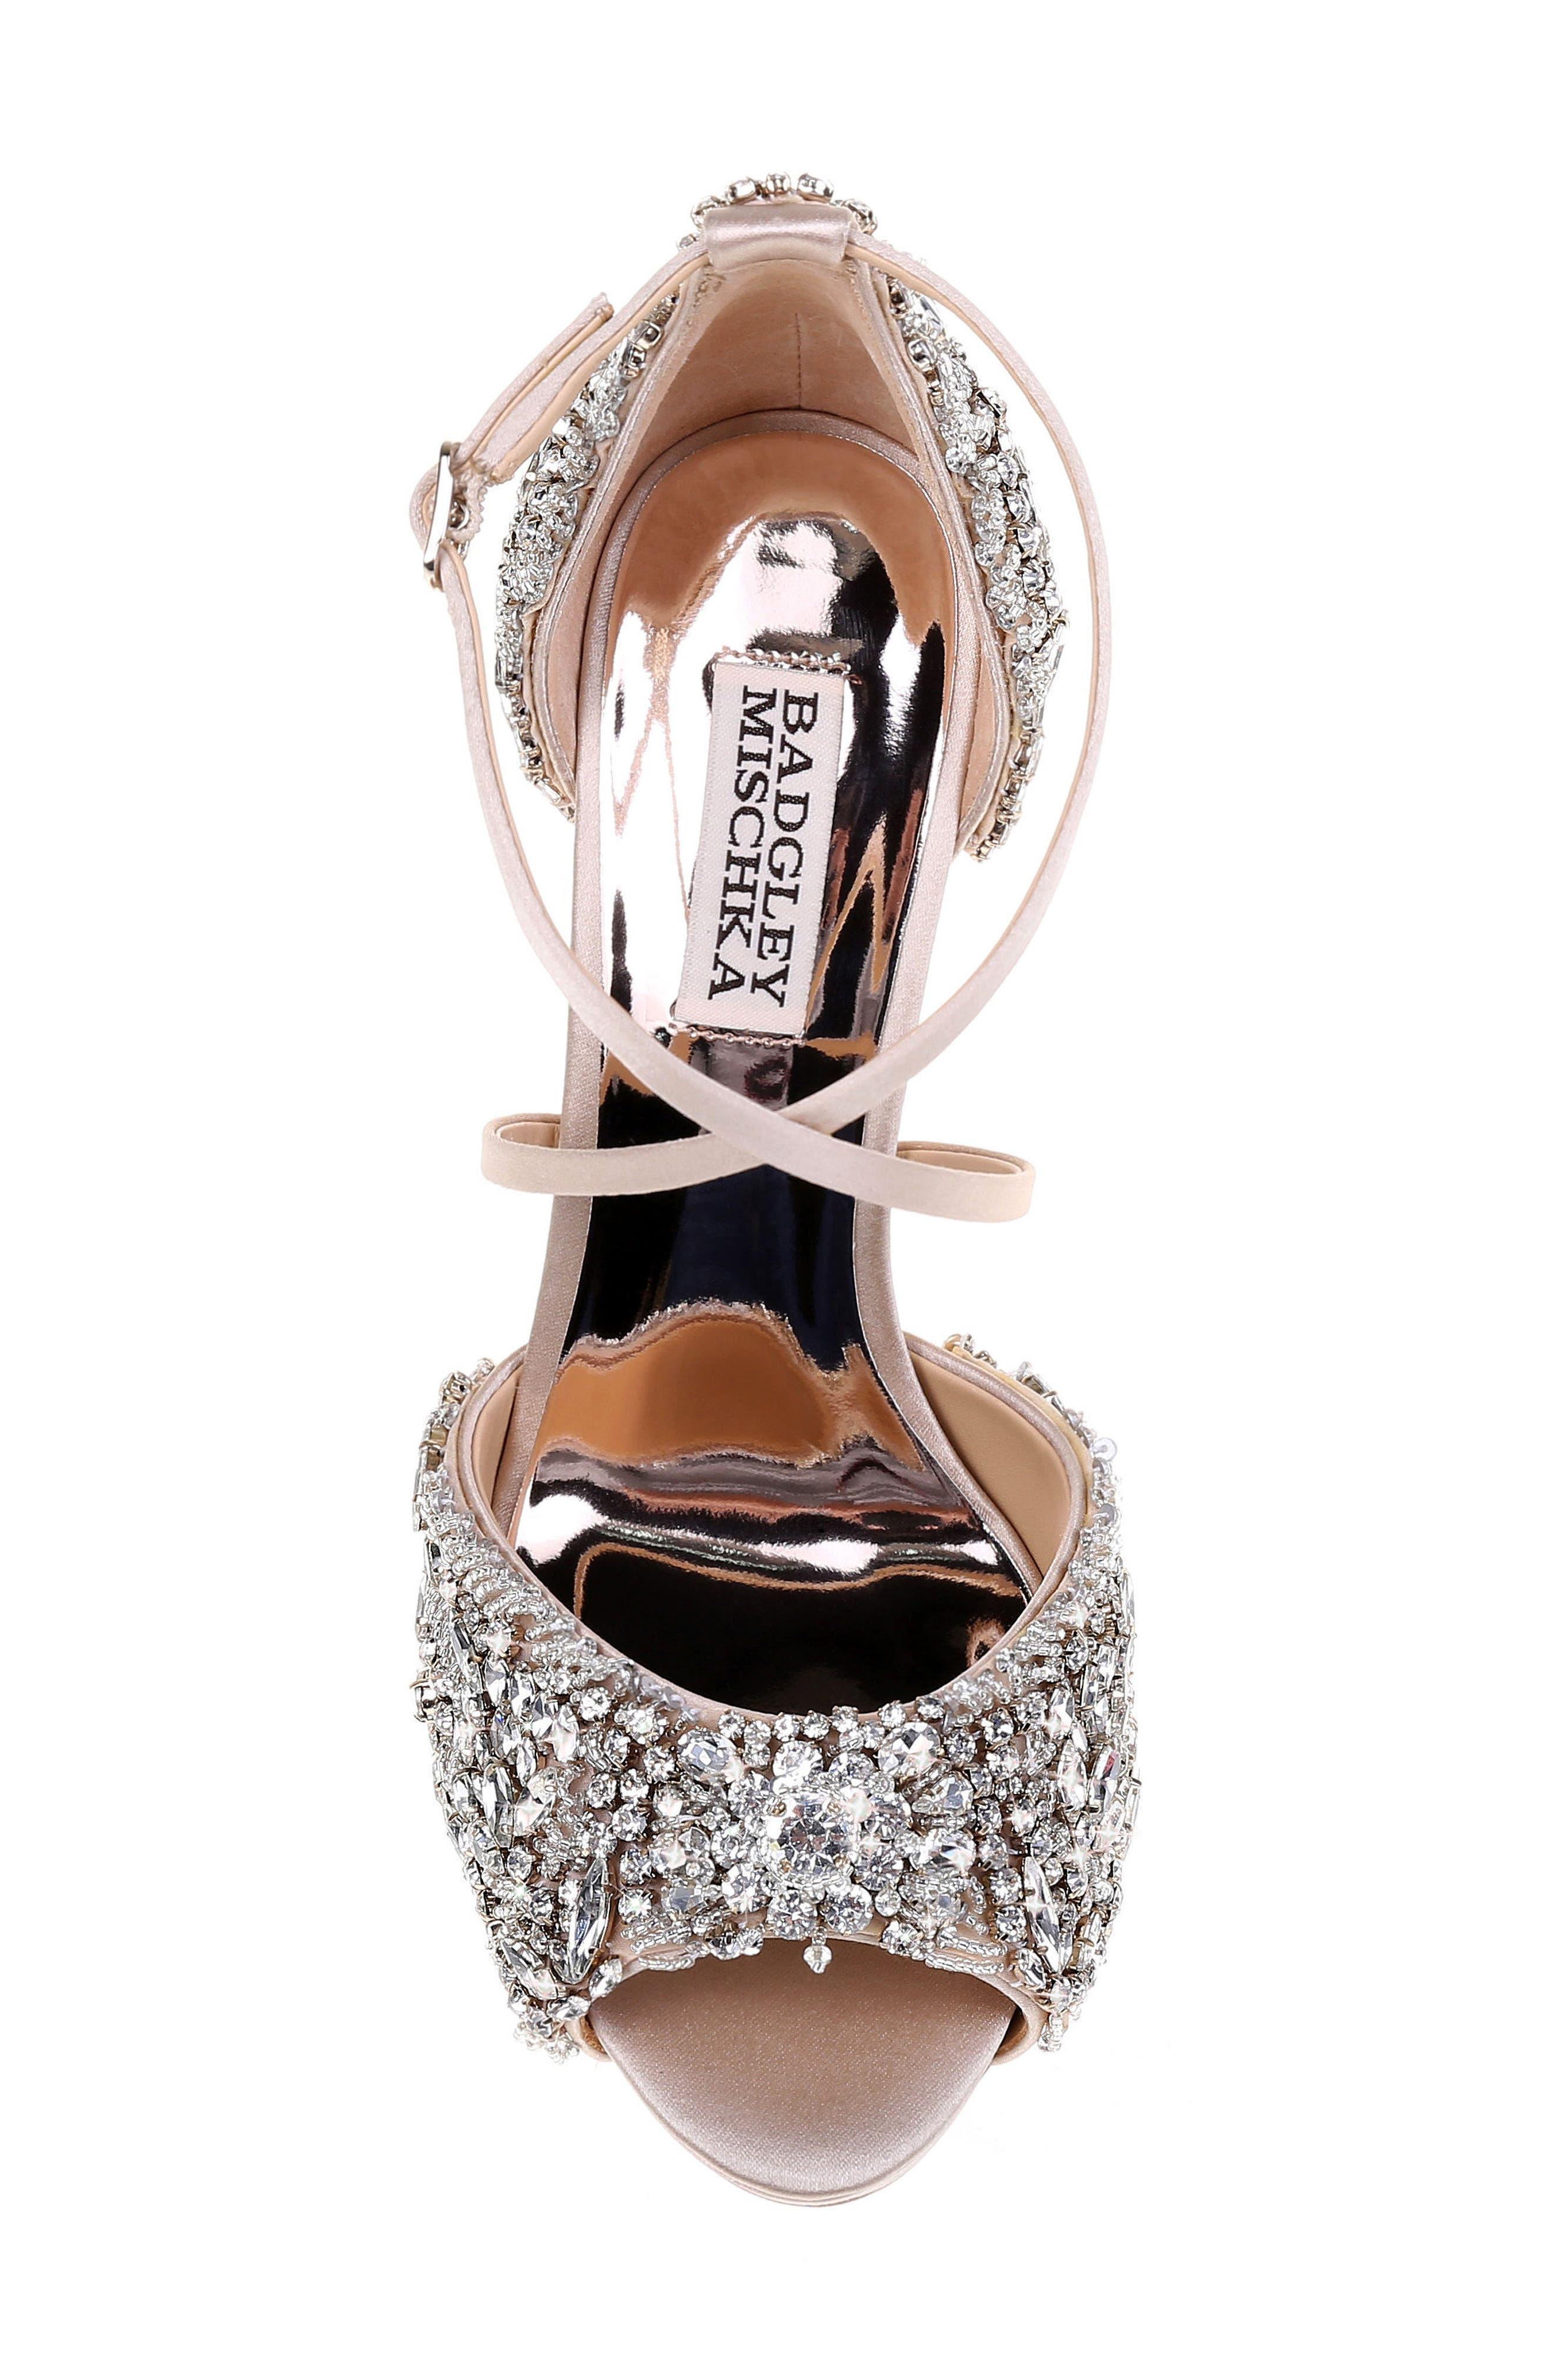 BADGLEY MISCHKA COLLECTION, Badgley Mischka Hyper Crystal Embellished Sandal, Alternate thumbnail 5, color, 100